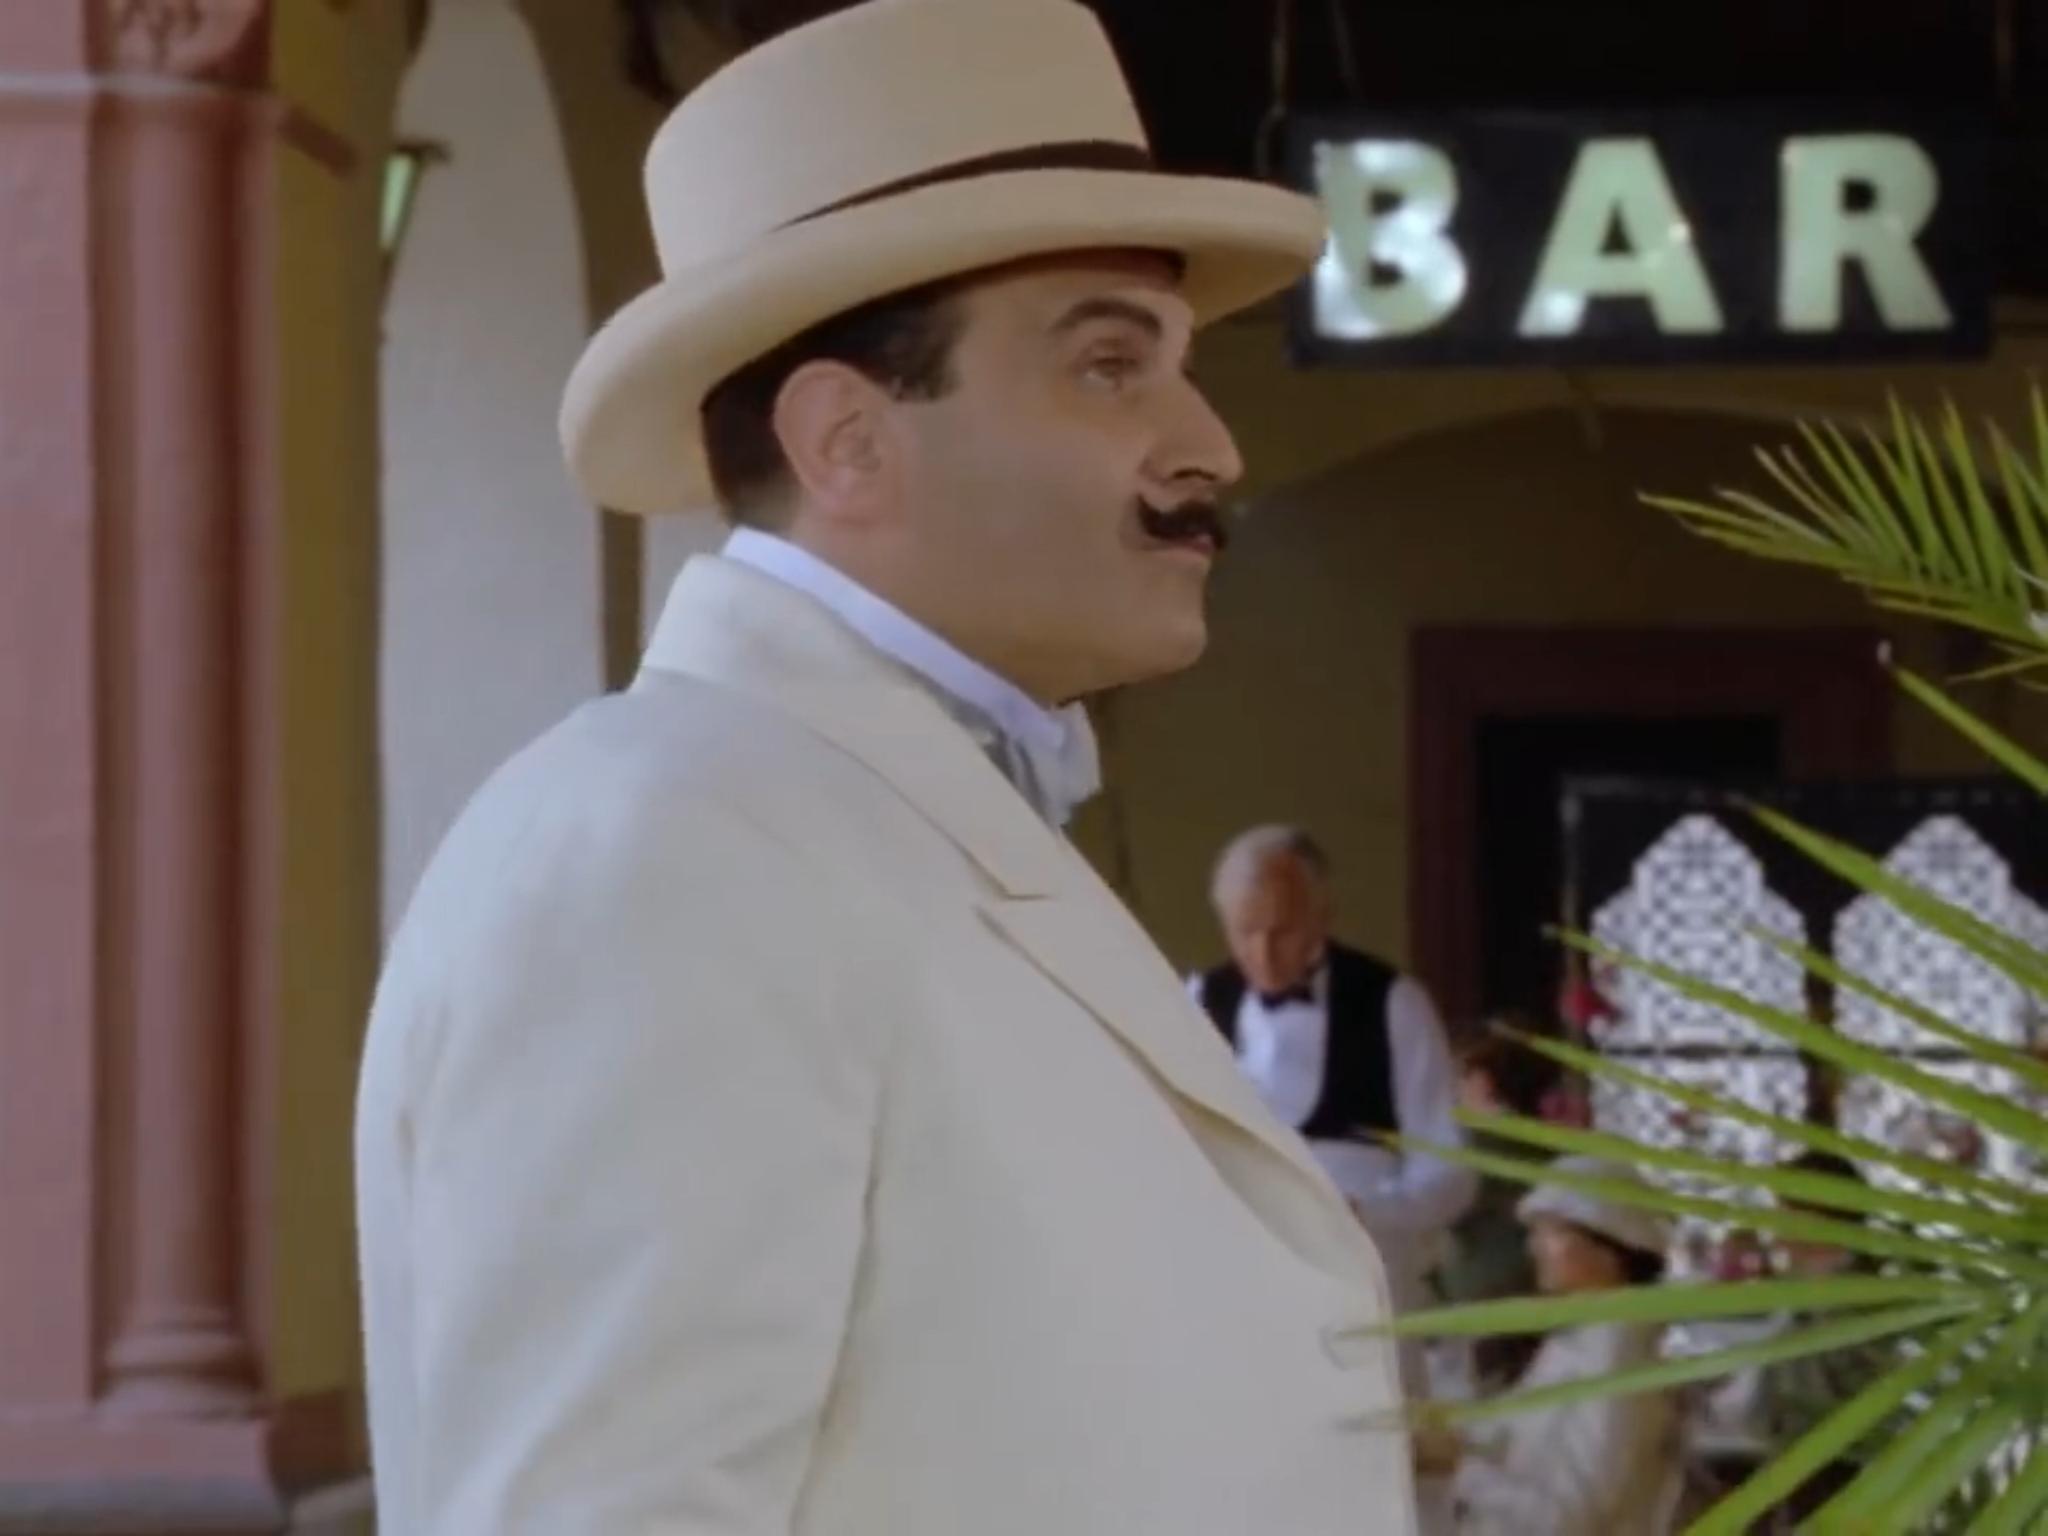 Agatha Christie. Poirot in, The yellow Iris. | Agatha Christie ...